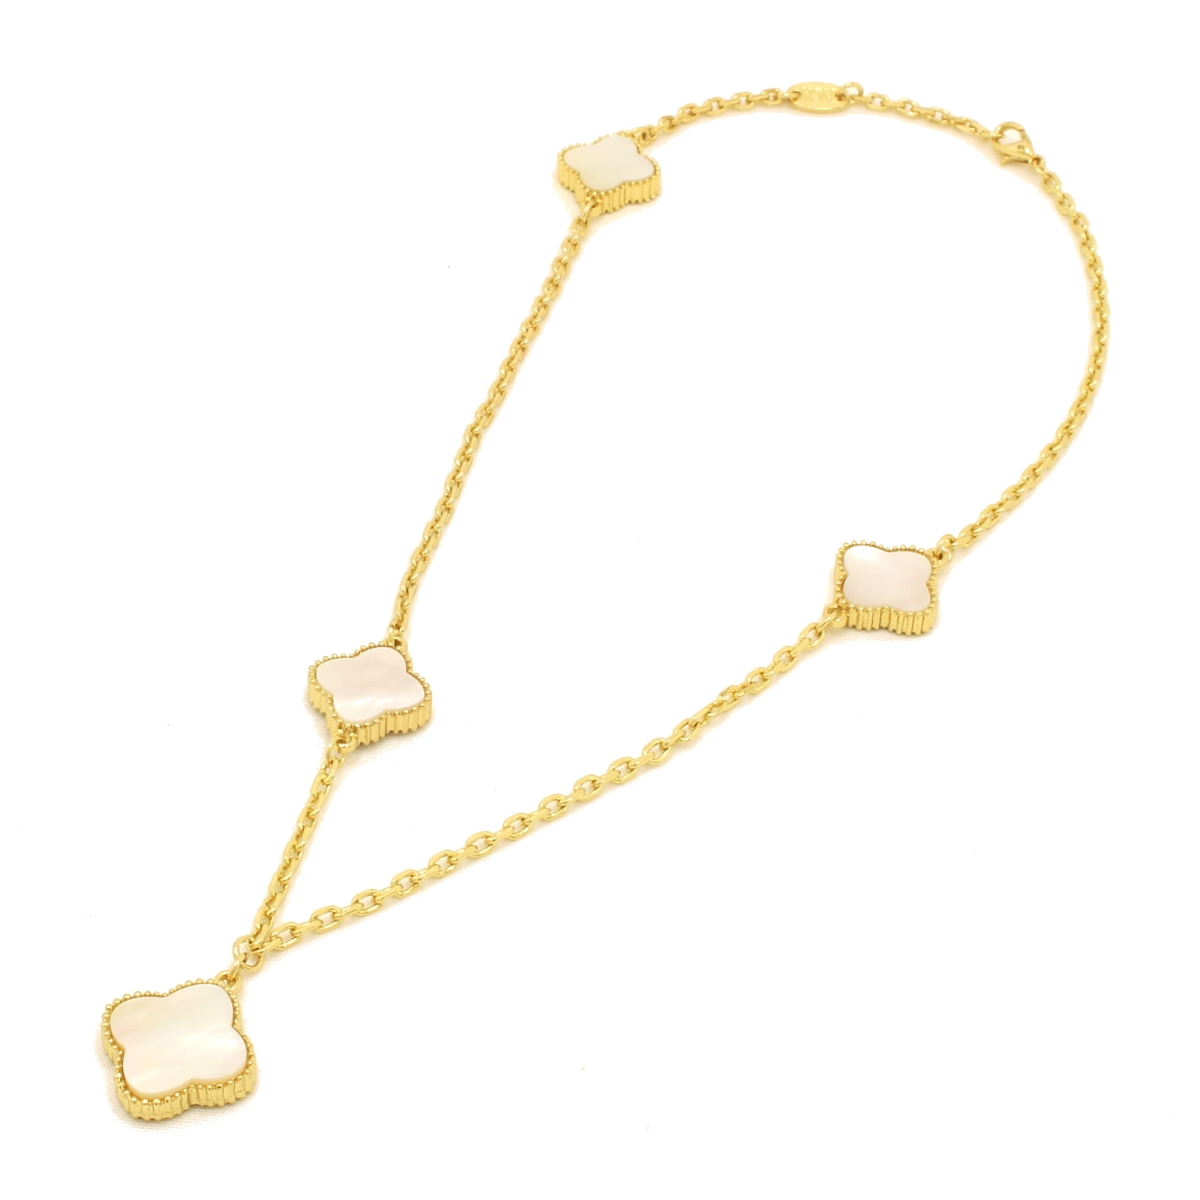 Accessorykanon rakuten global market mil gold flower accent mil gold flower accent flower necklace yellow lip pearl shell shell clover 3 flower 1 branch mightylinksfo